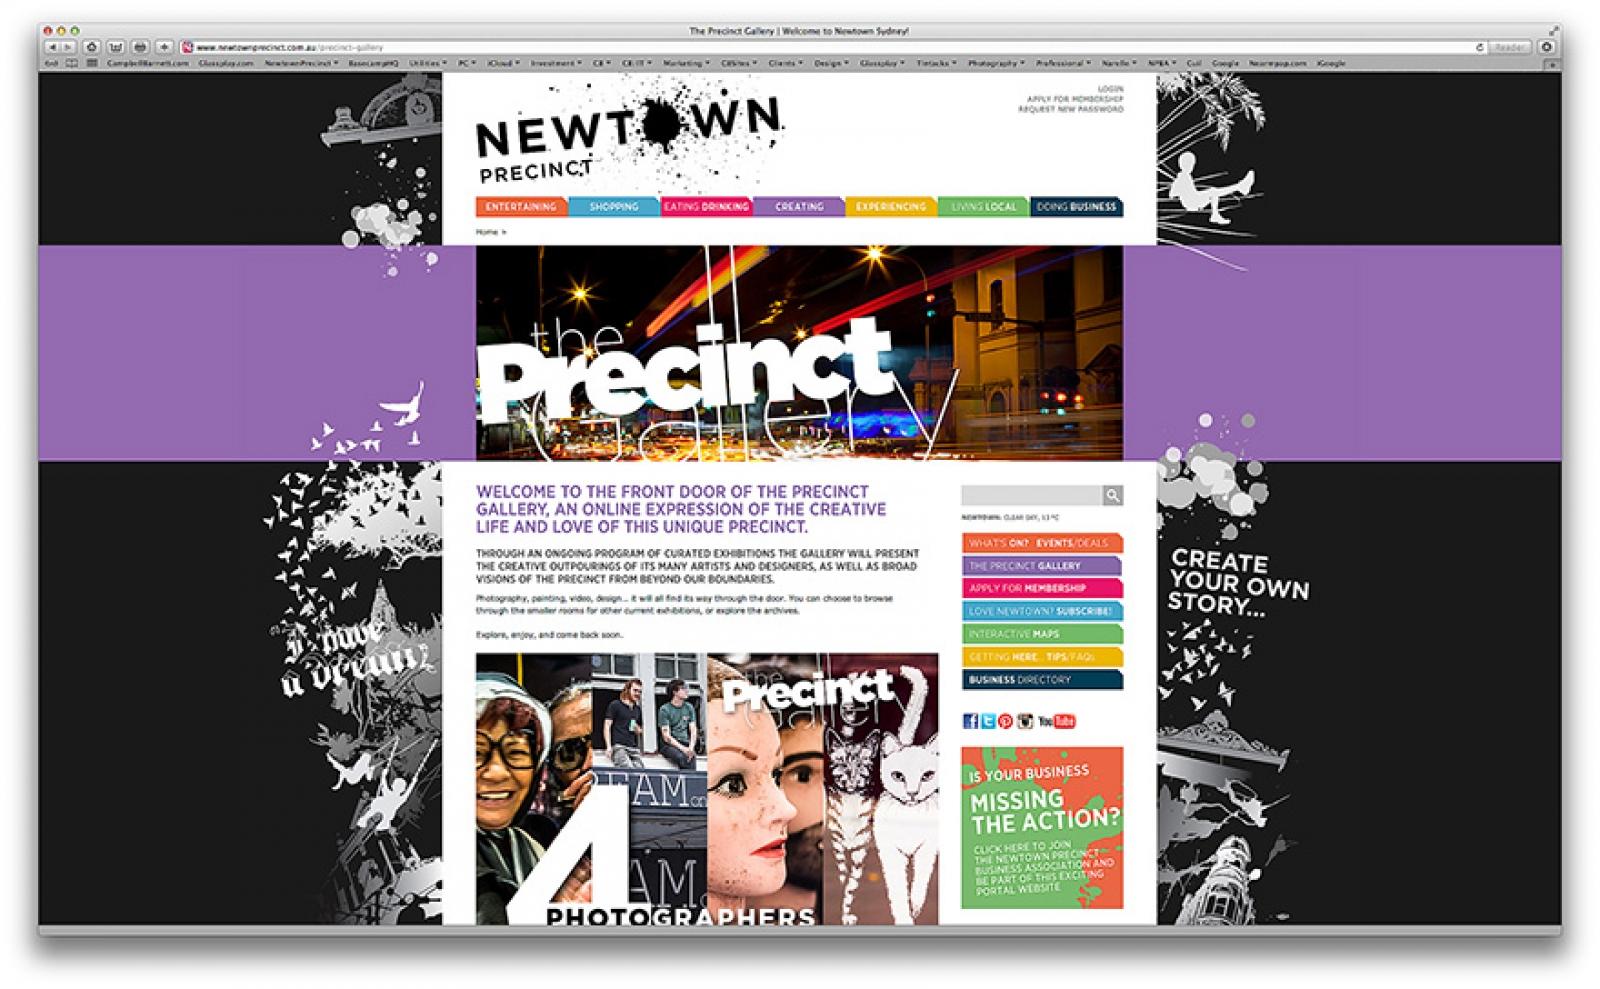 Newtown Precinct Web Portal